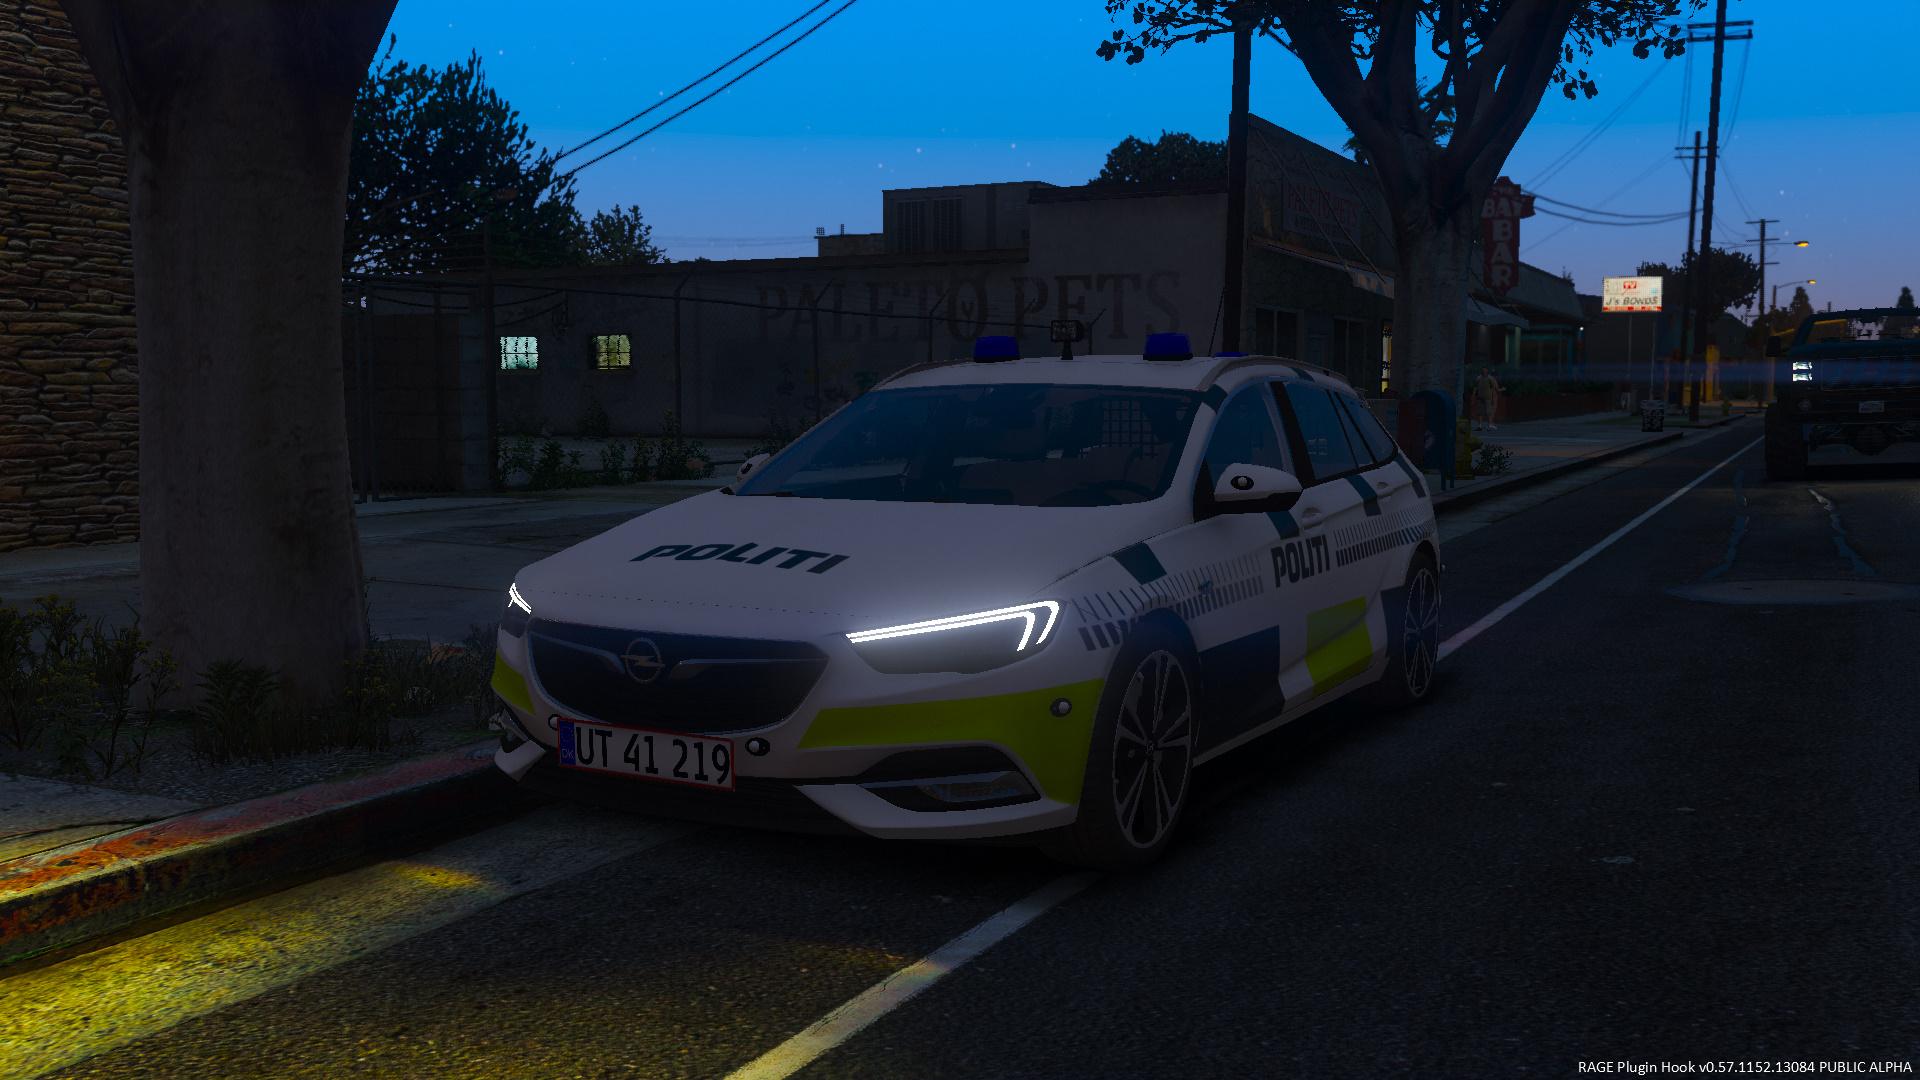 2017 Opel Insignia Sports Tourer Danish Police Els Replace 2018 C4eb6e Gta5 09 08 19 30 24 982